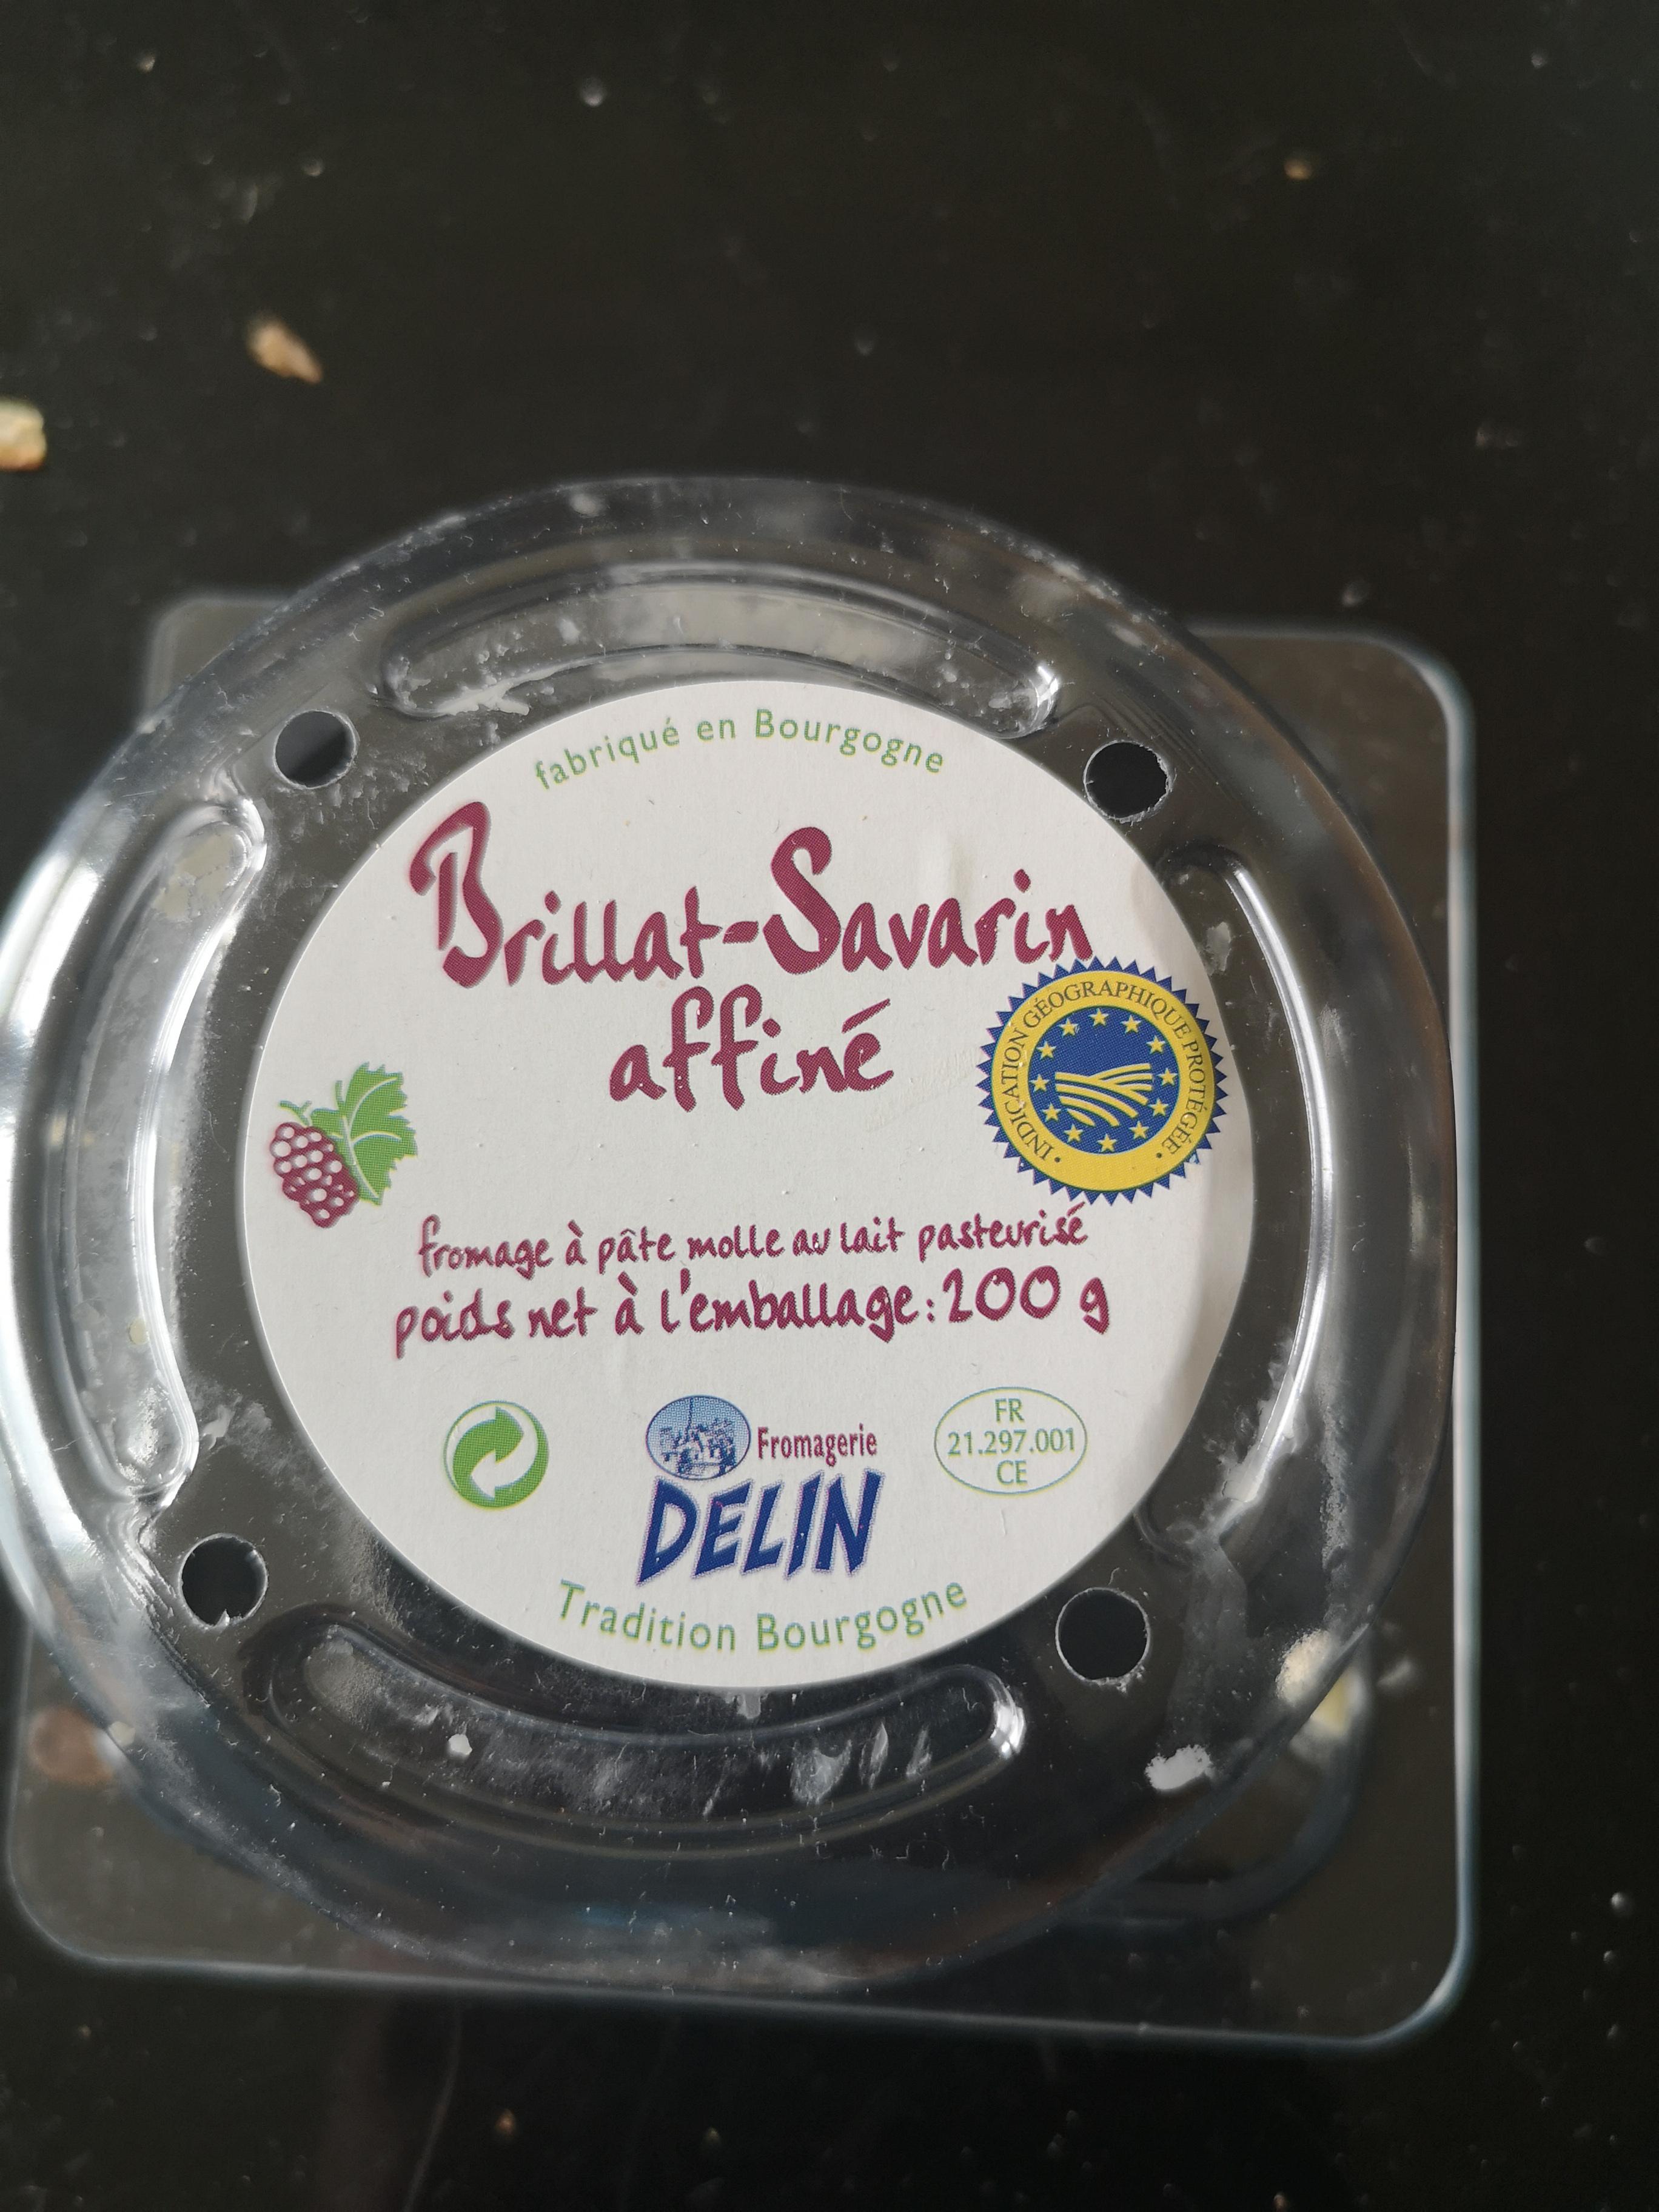 Brillat-Savarin affiné